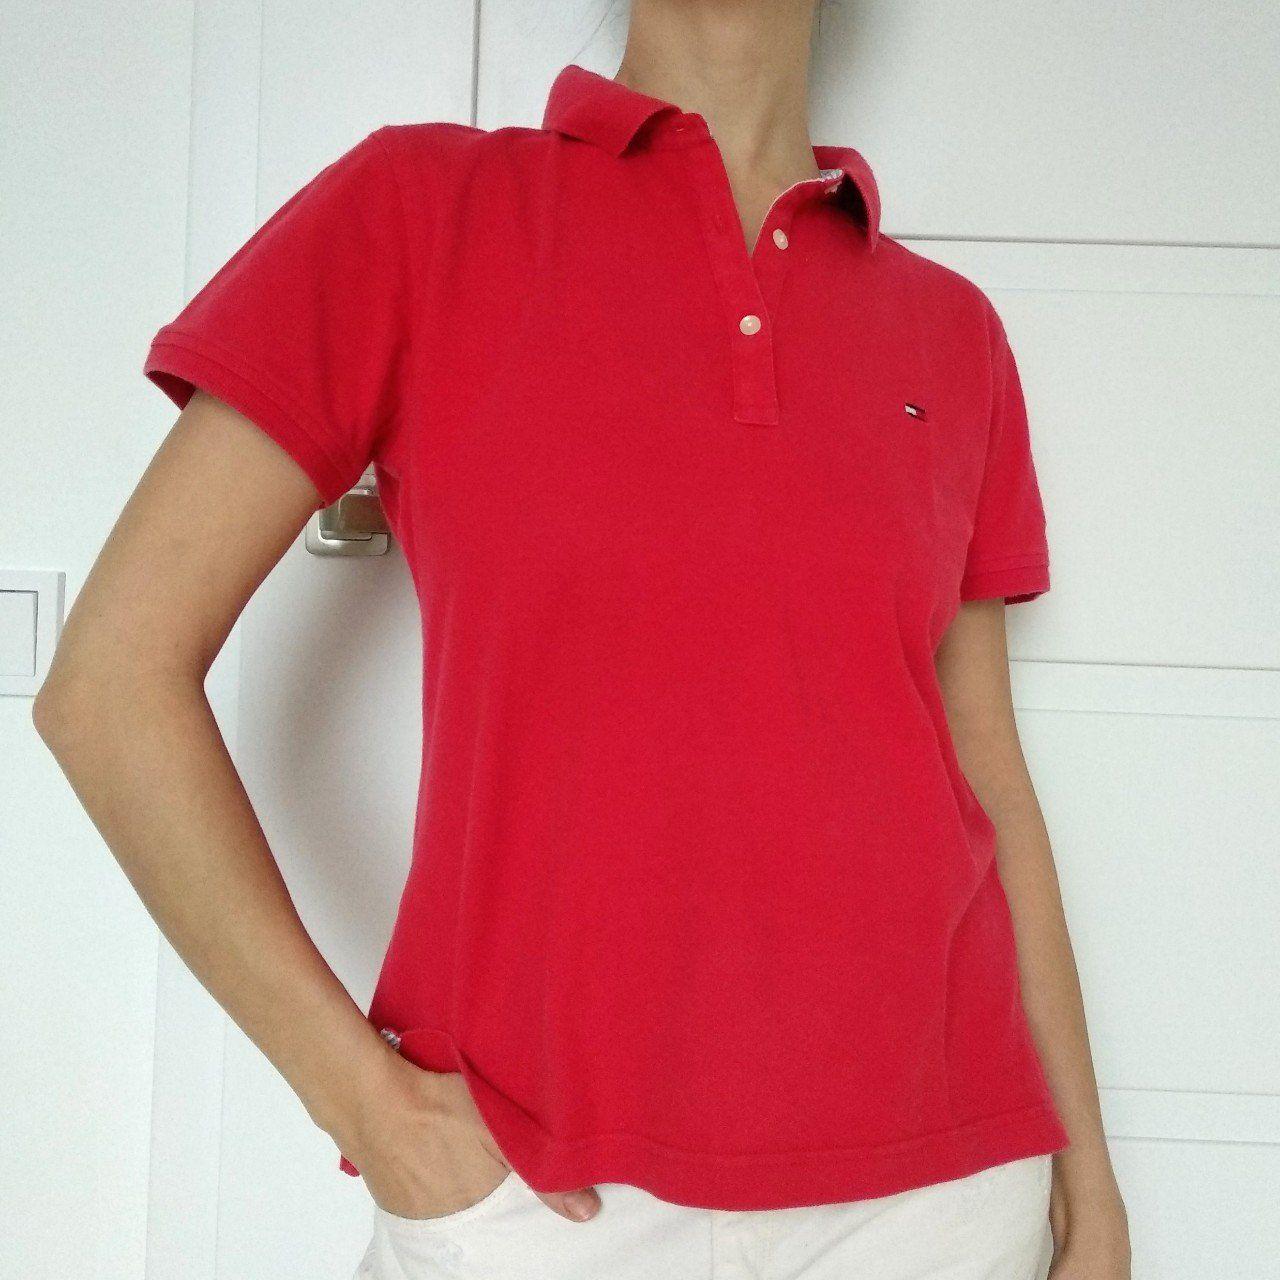 5f8b1d9c Red Tommy Hilfiger polo t-shirt #depop #vintage #tommyhilfiger #poloshirt